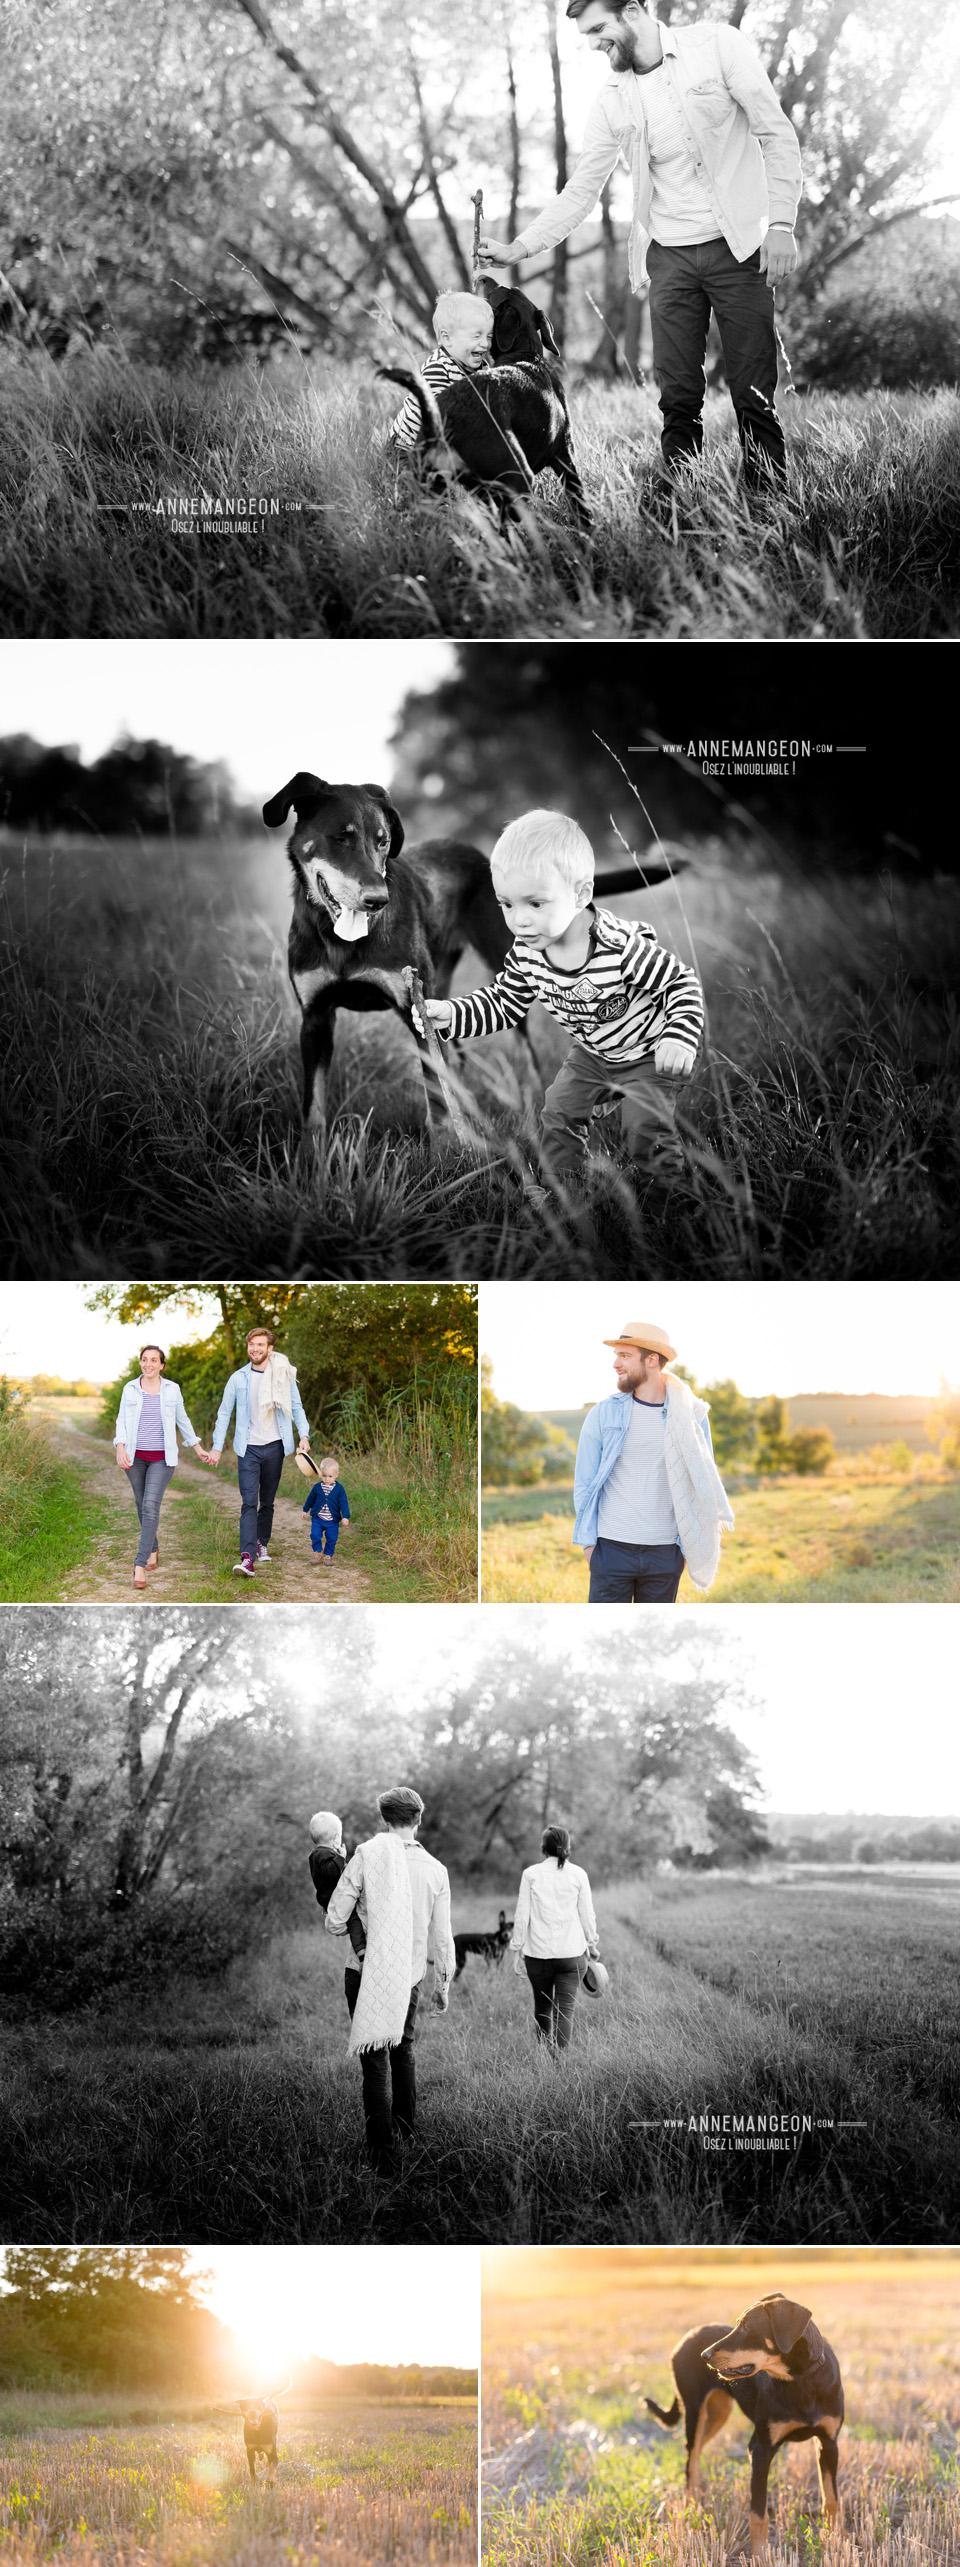 Séance photo Famille Nancy @ Anne Mangeon Photographe_03